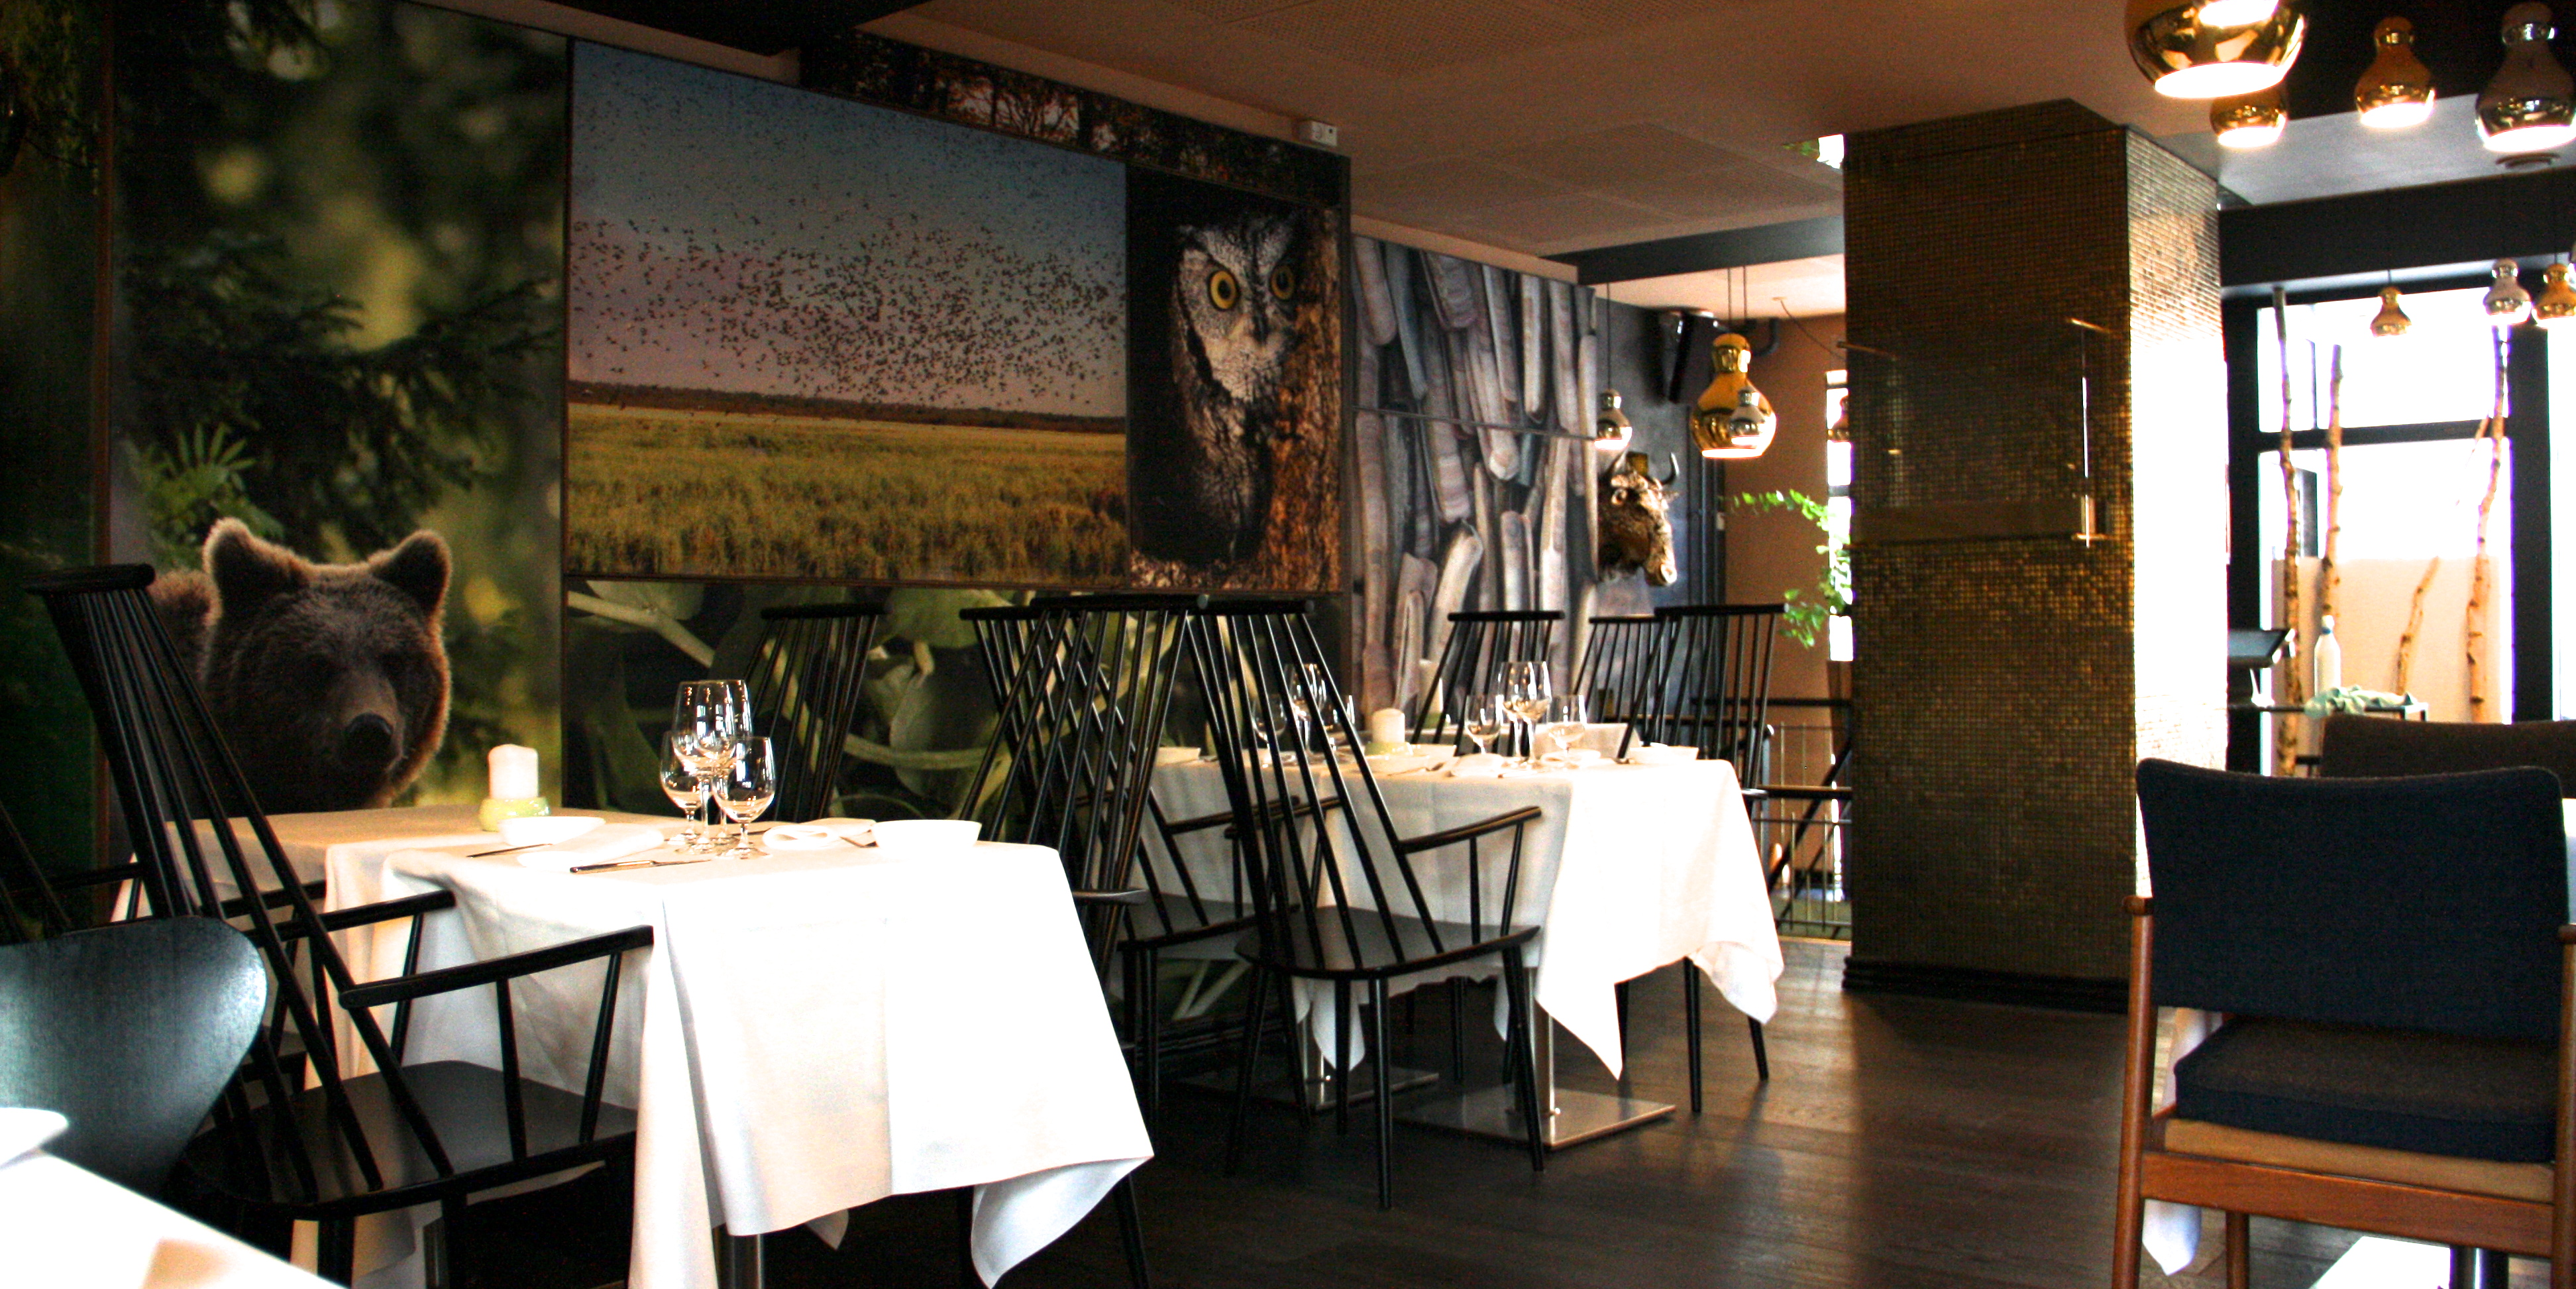 nordisk spisehus århus